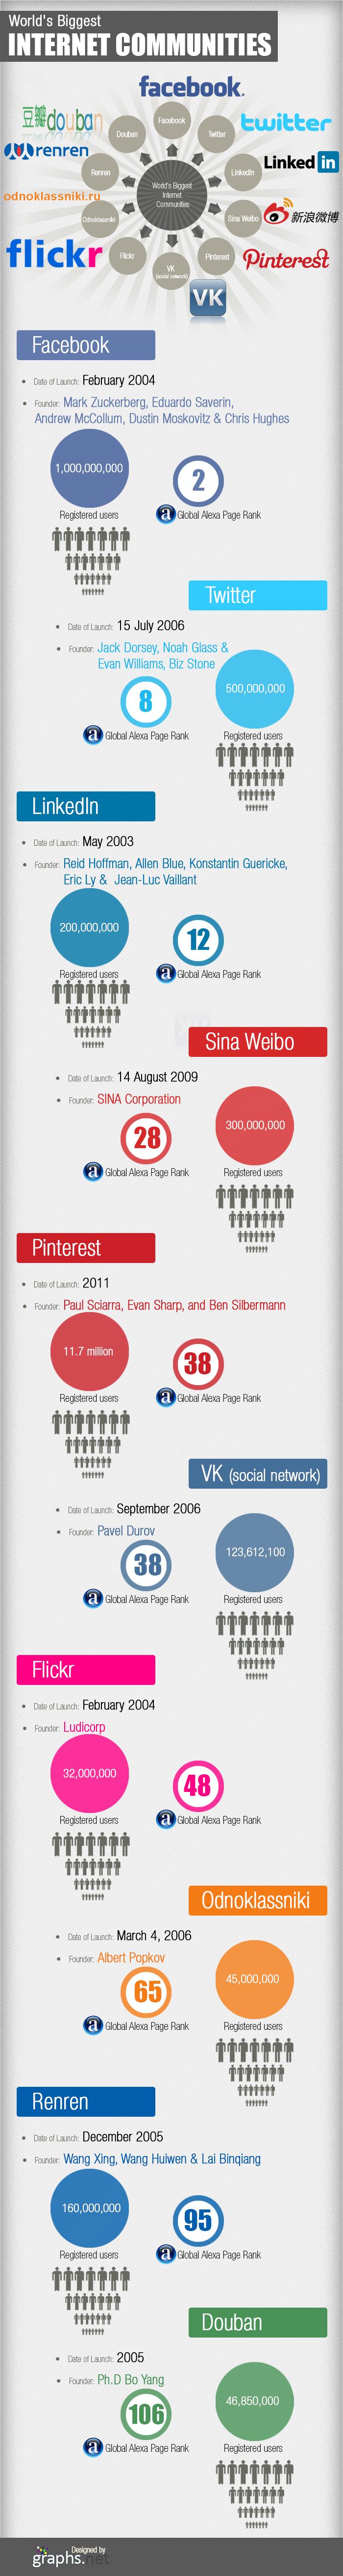 world's-biggest-internet-communities